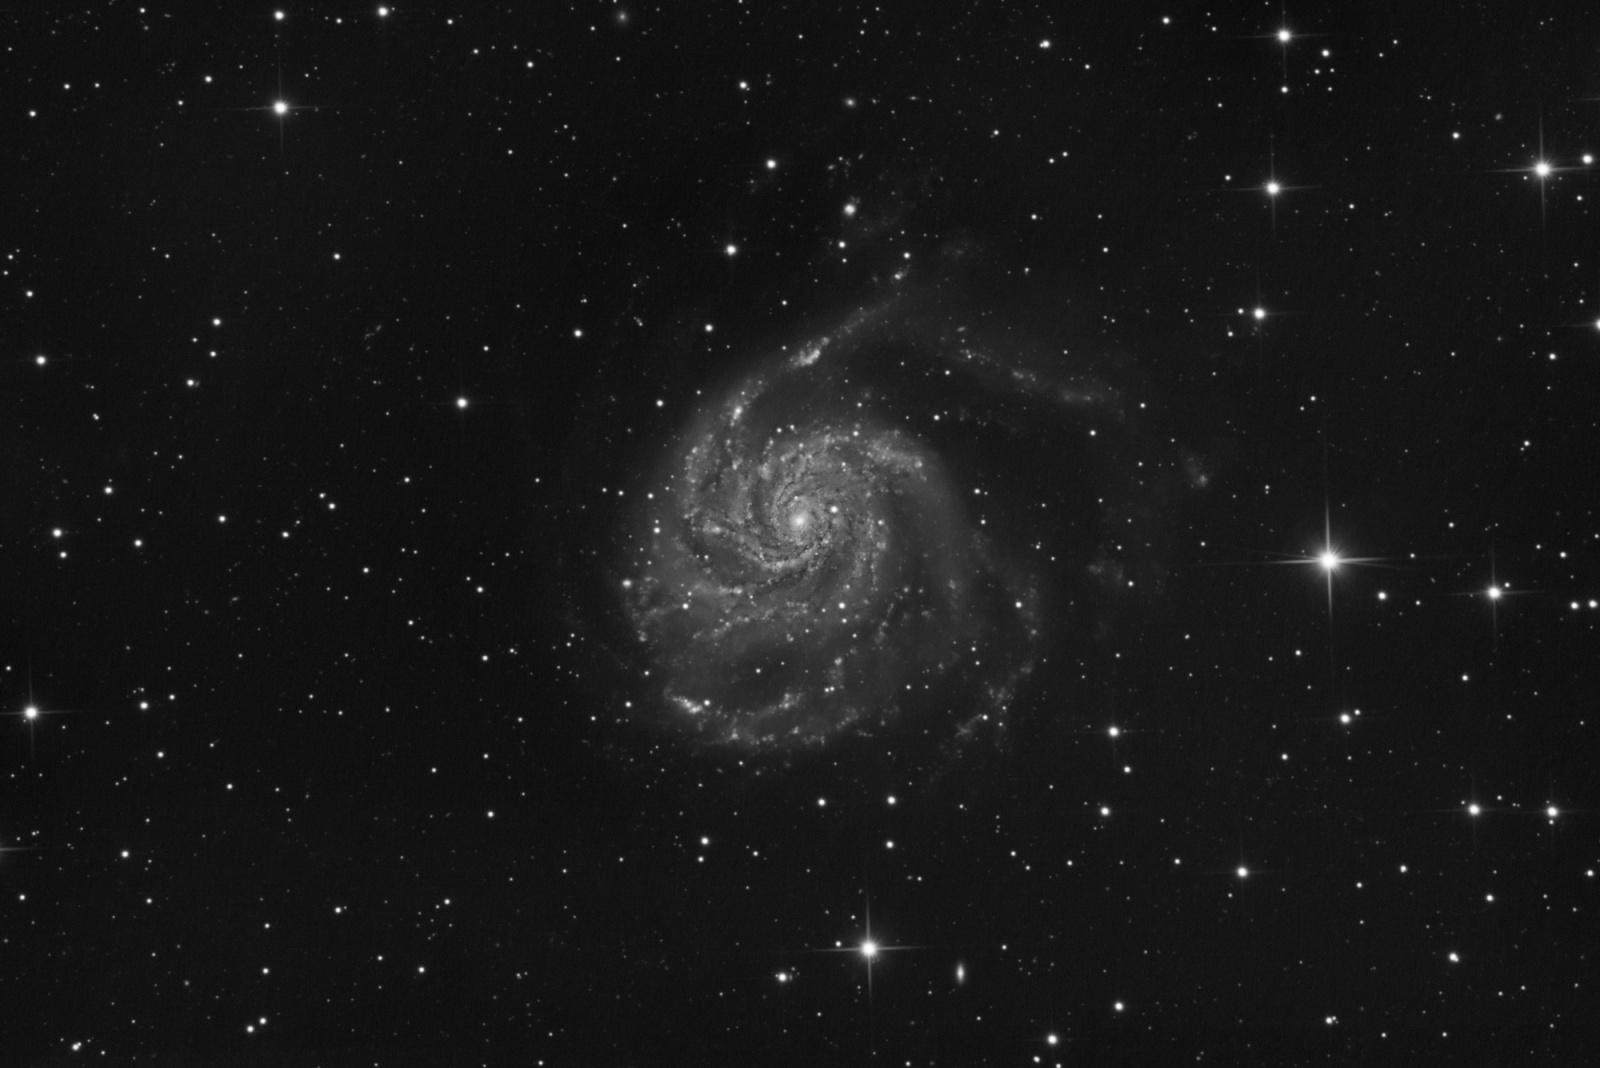 M101_Lum_QHY_AP.jpg